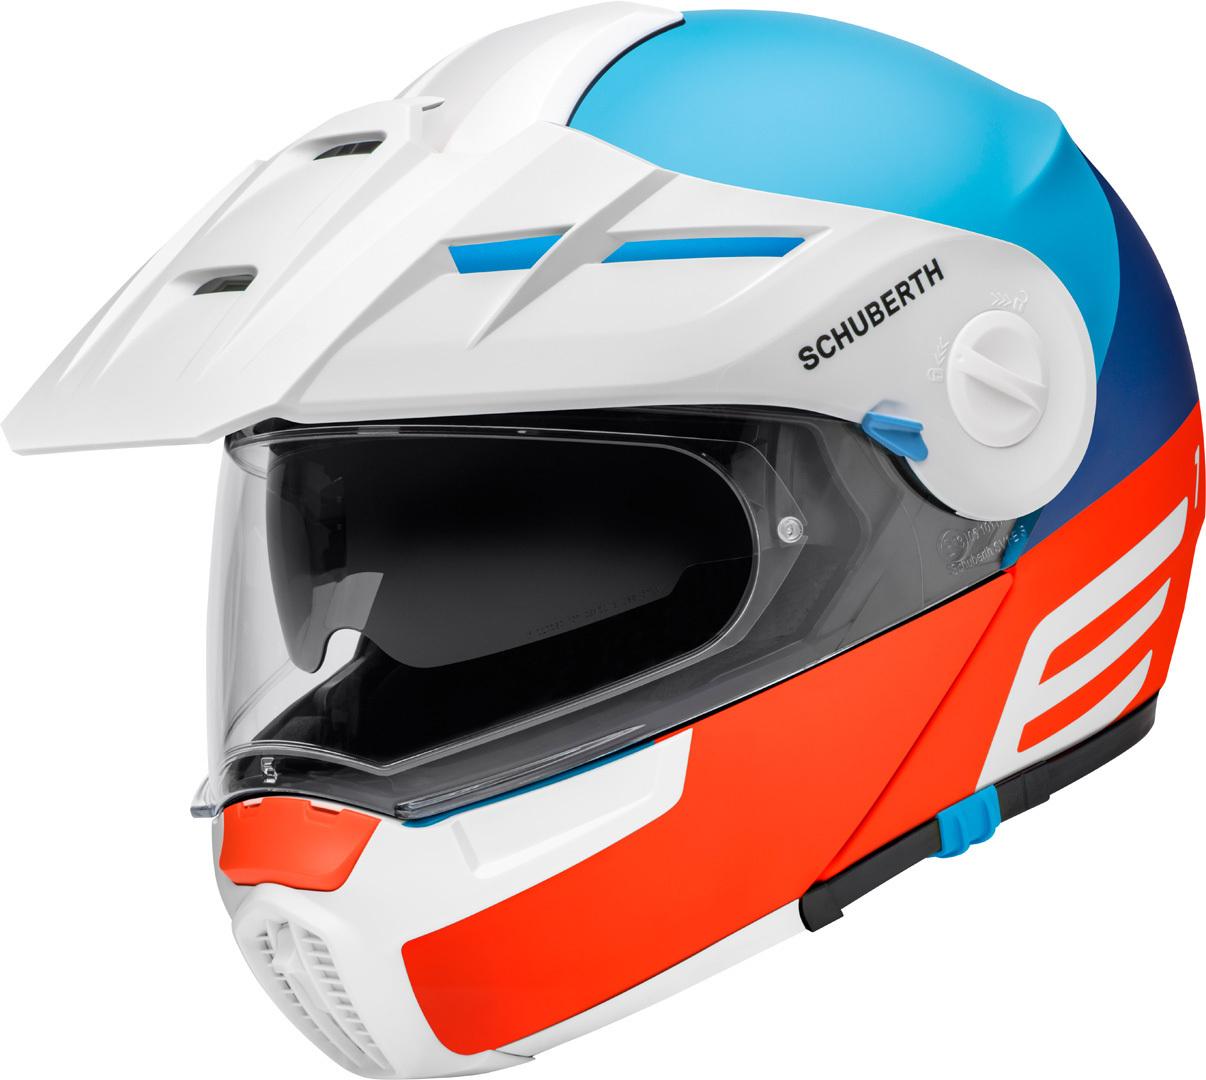 Schuberth E1 Cut Klapphelm, weiss-blau-orange, Größe XS, weiss-blau-orange, Größe XS